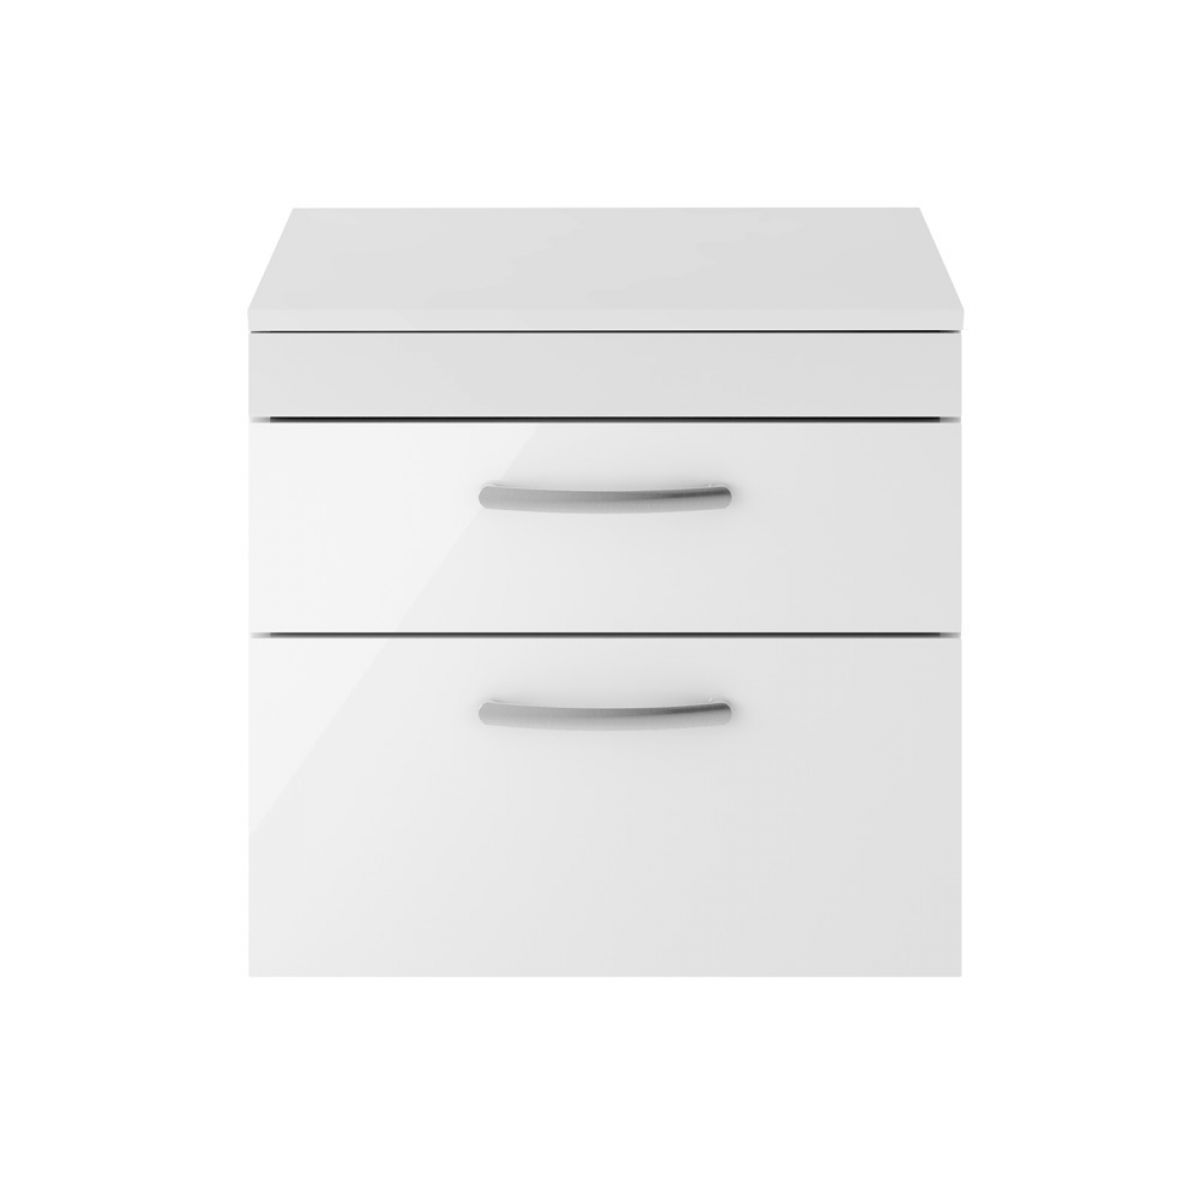 Premier Athena Gloss White 2 Drawer Wall Hung Vanity Unit 600mm with Slimline Basin